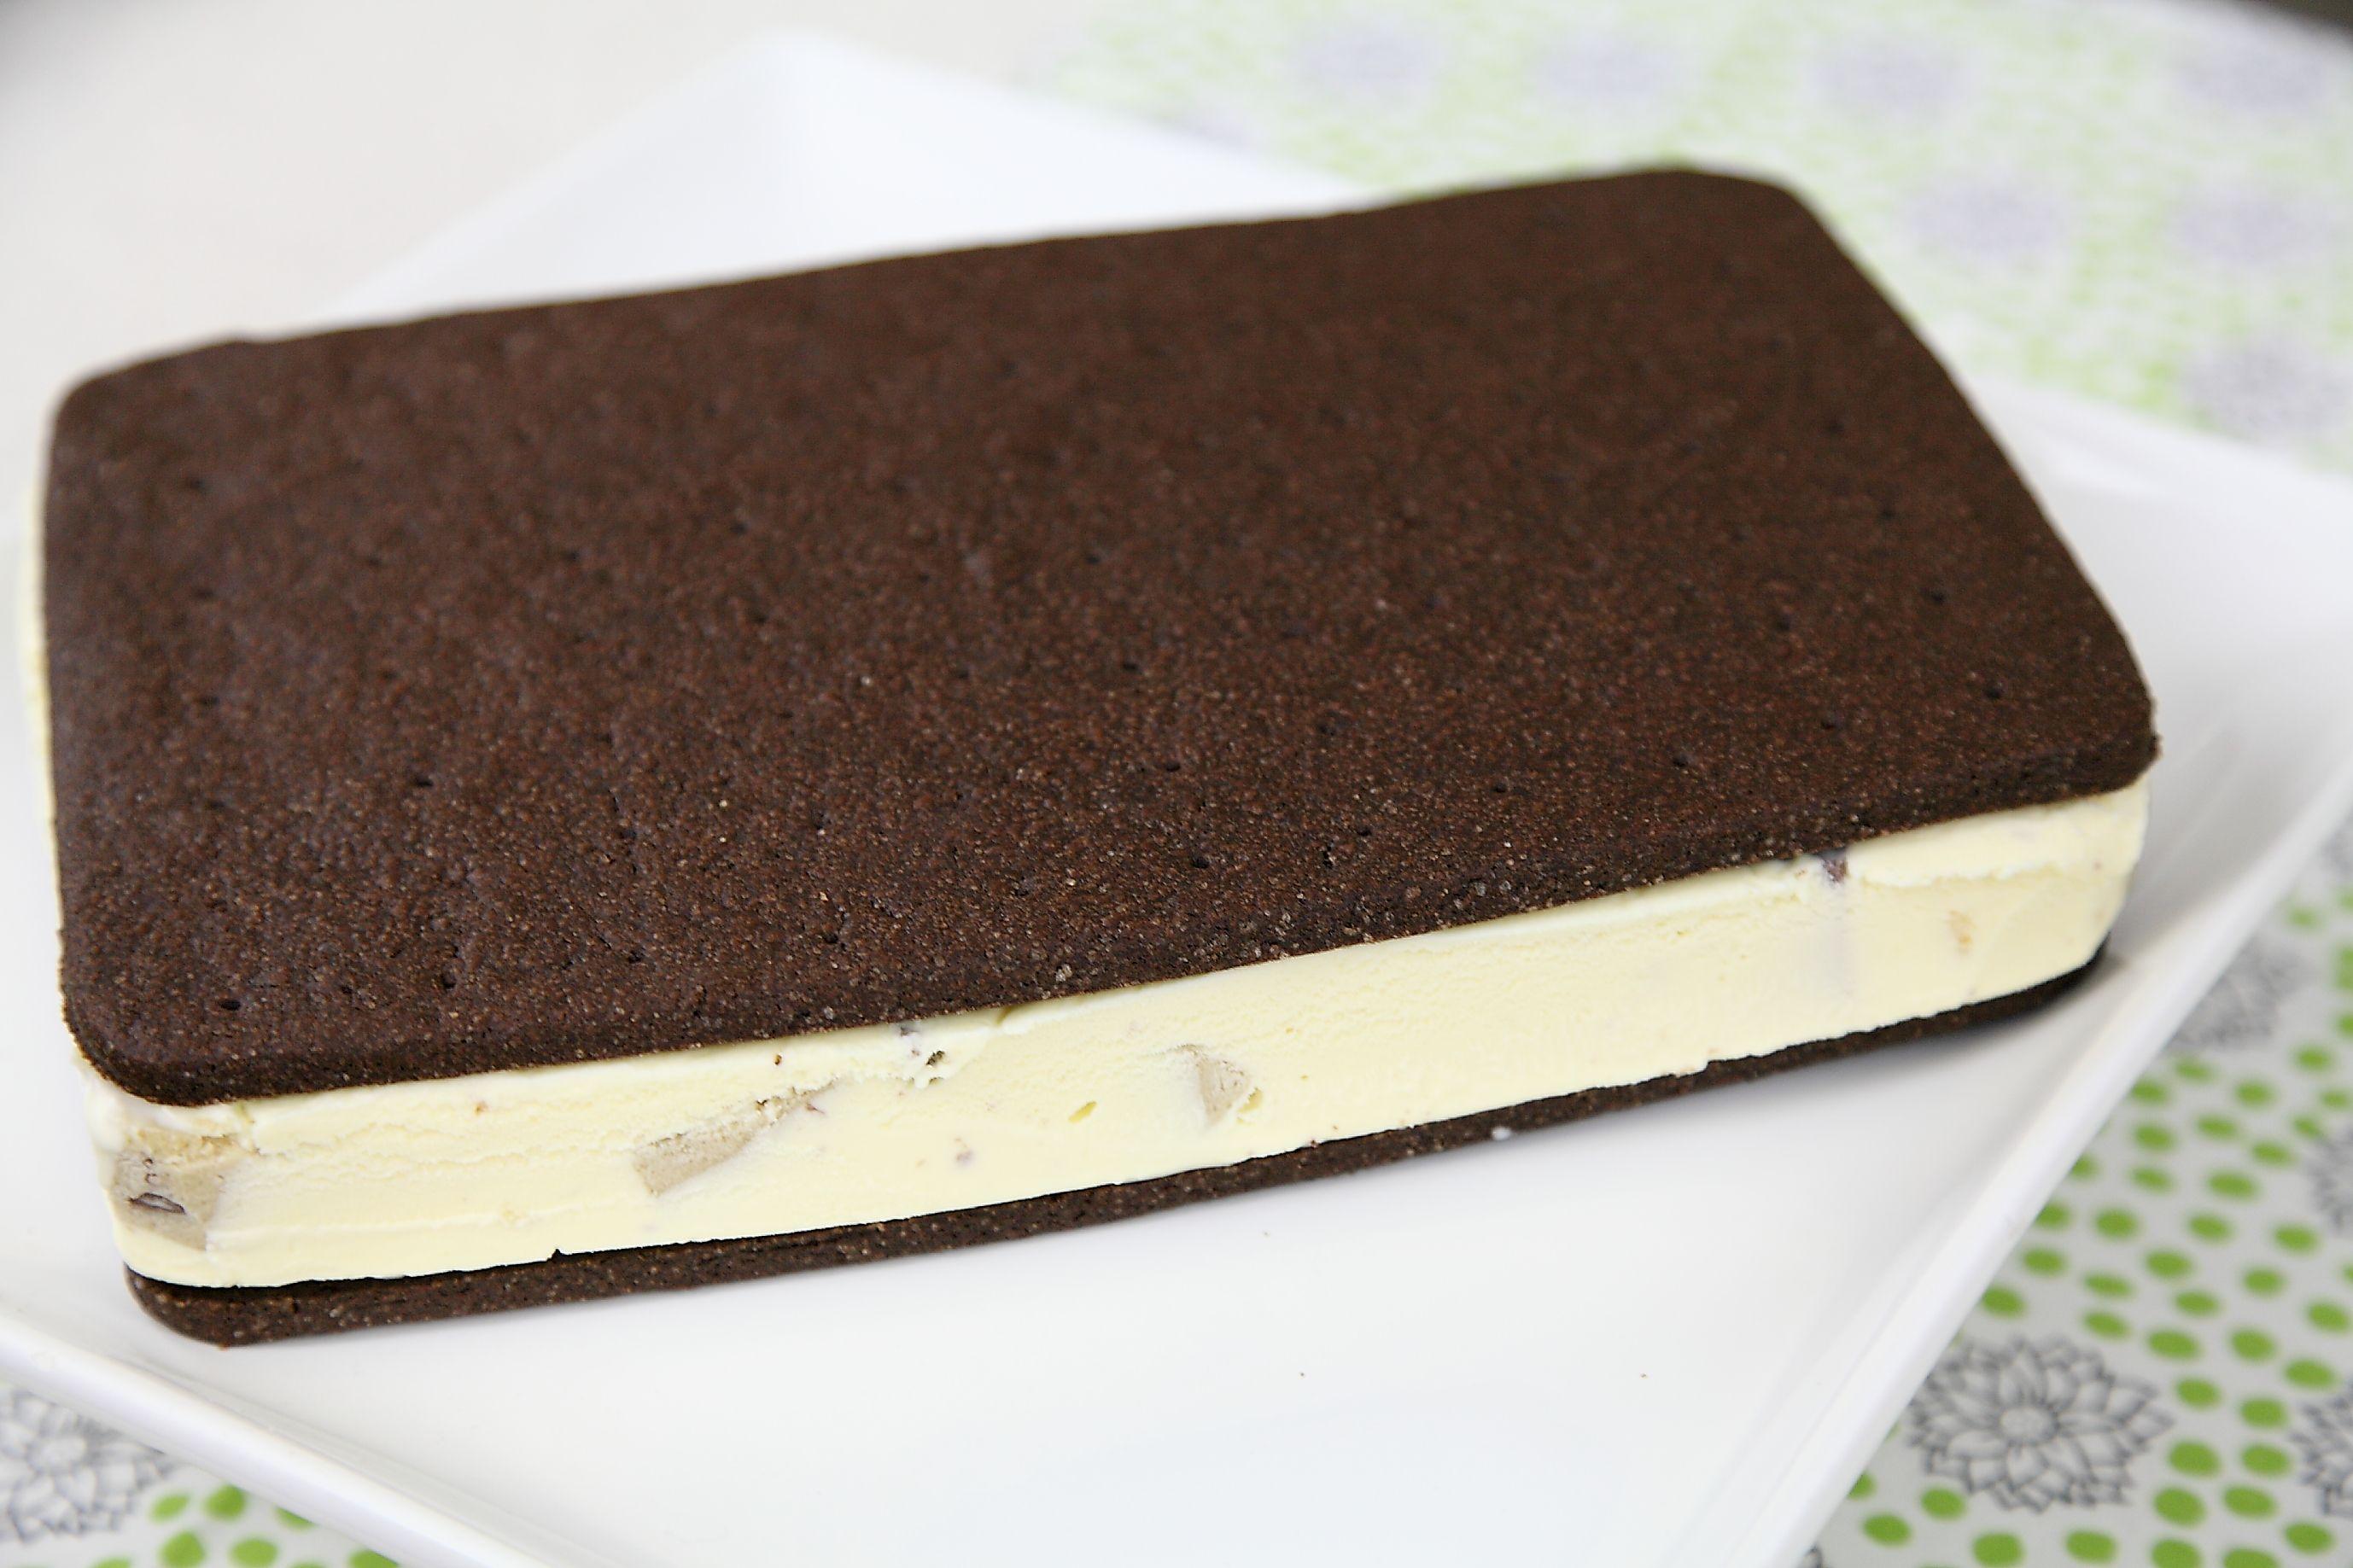 Choc Chip Cookie Dough Ice Cream Sandwich